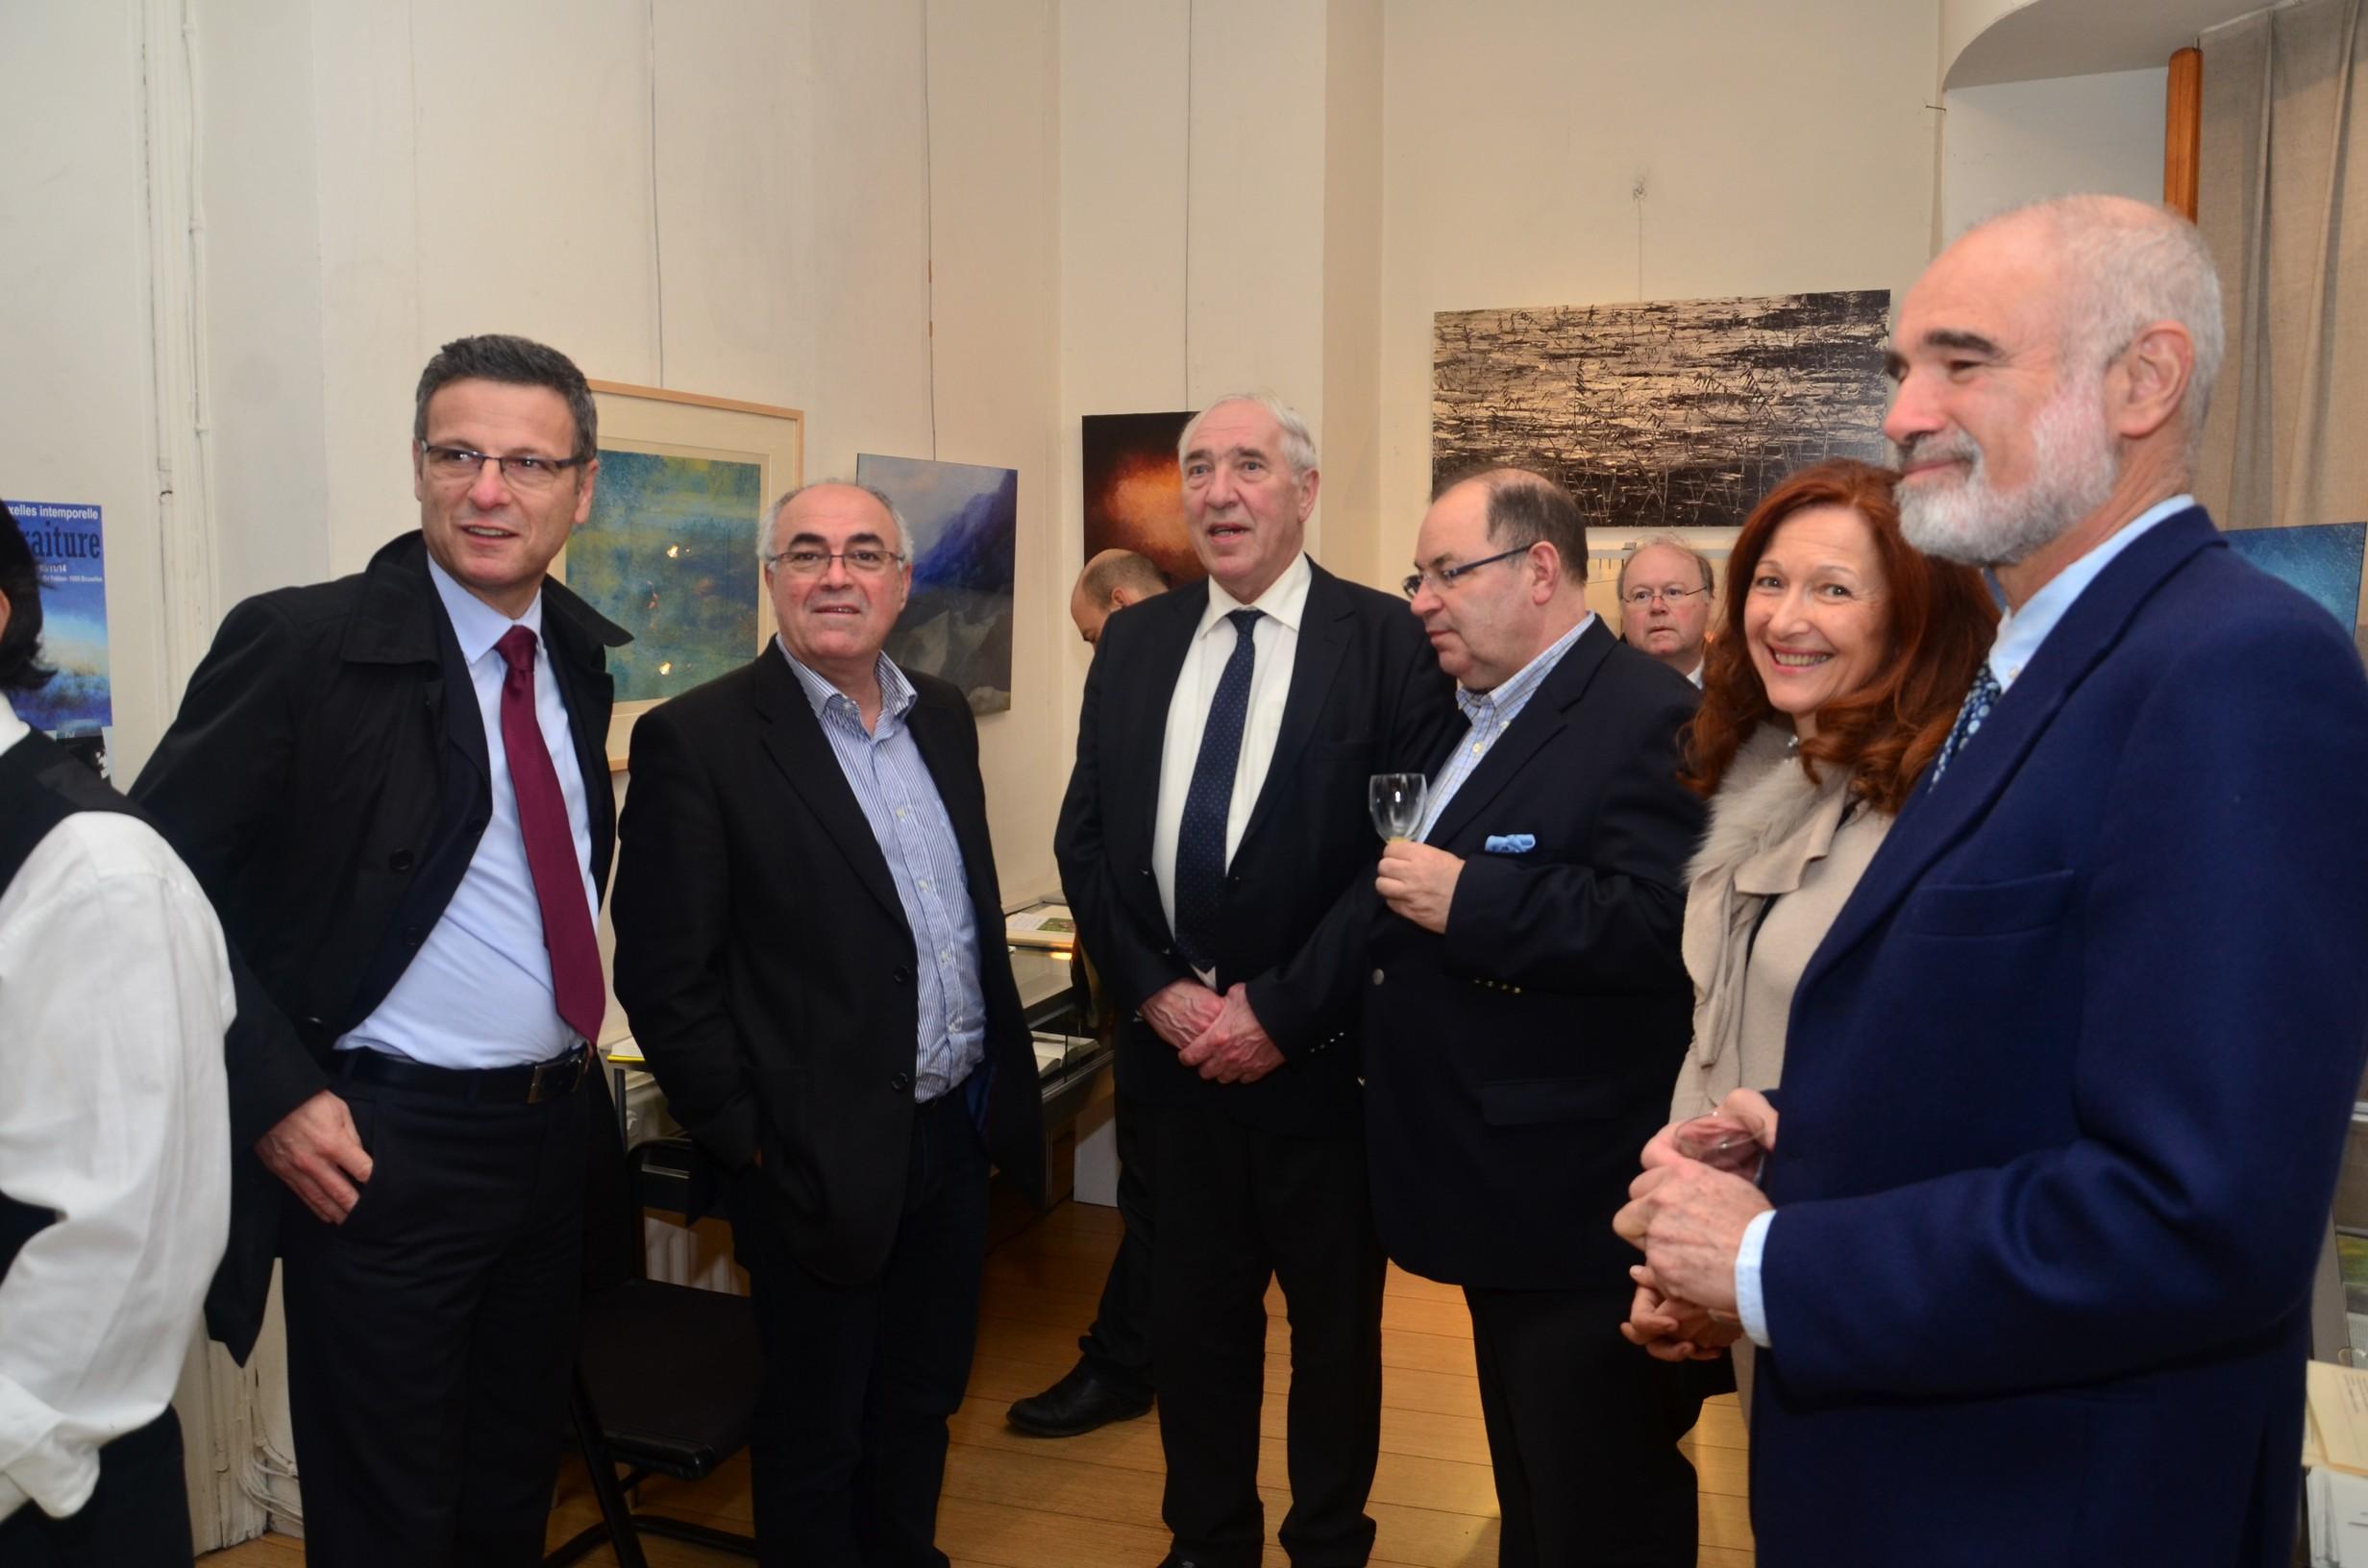 Vernissage Pol Fraiture 4.11.14 - Galerie Alfican